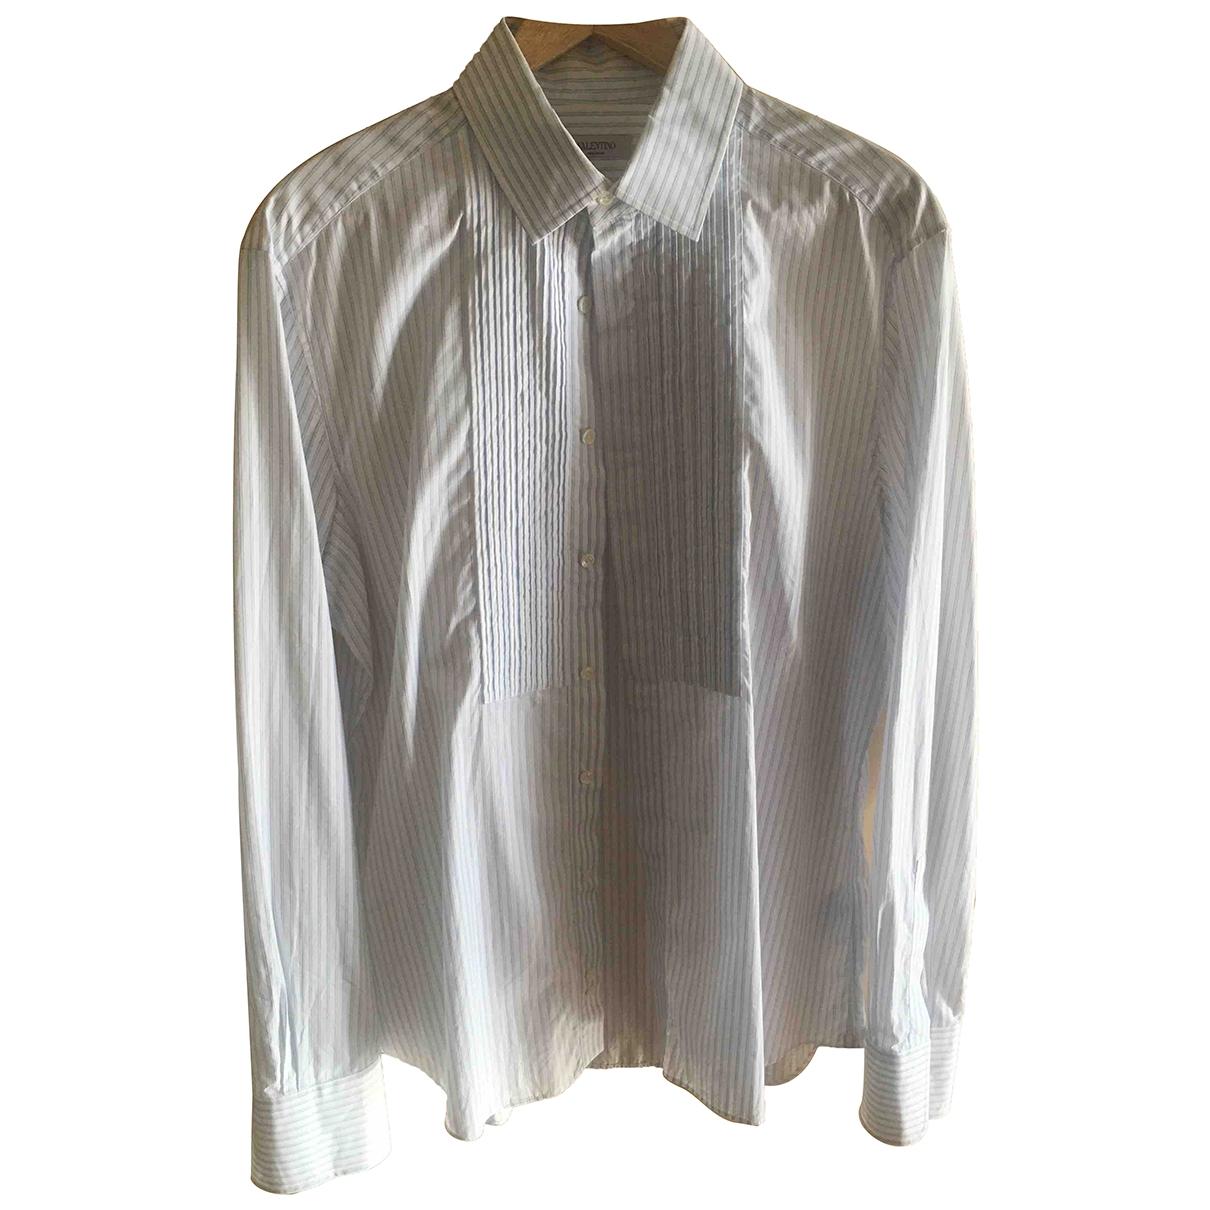 Valentino Garavani \N White Cotton Shirts for Men 17 UK - US (tour de cou / collar)